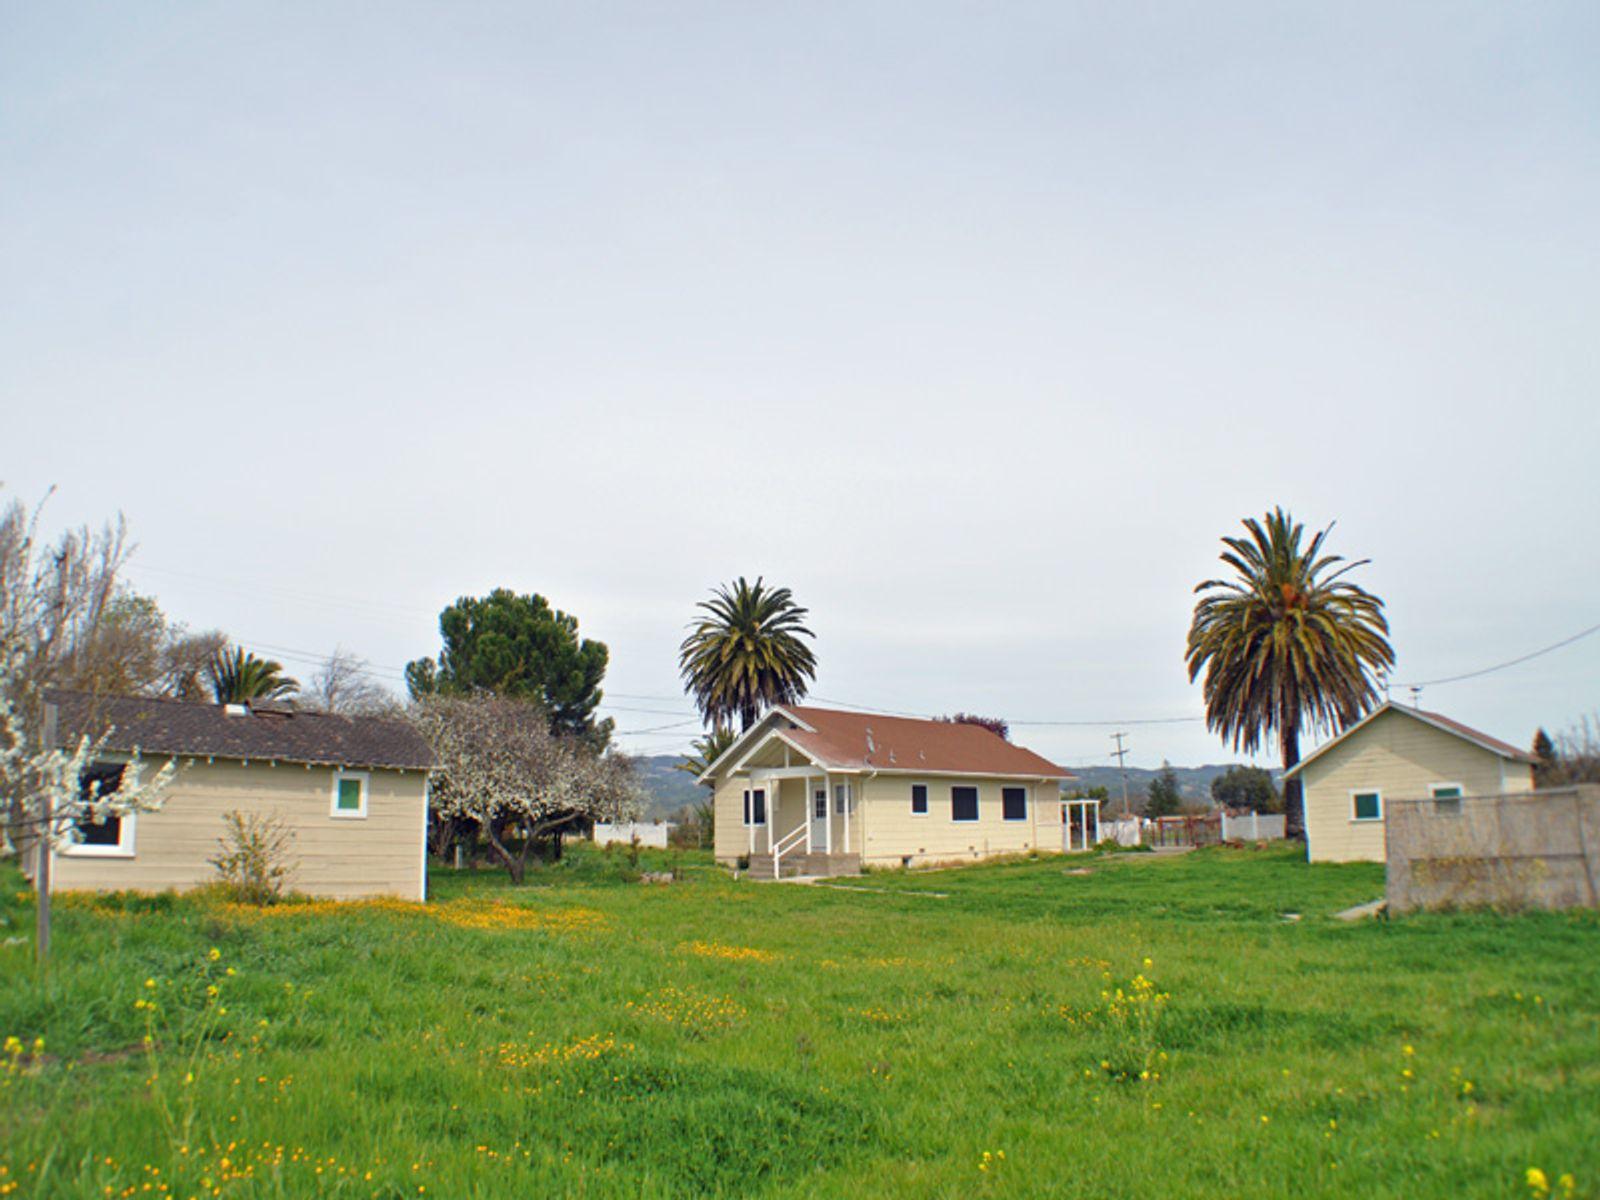 Sonoma Country - Four Acres